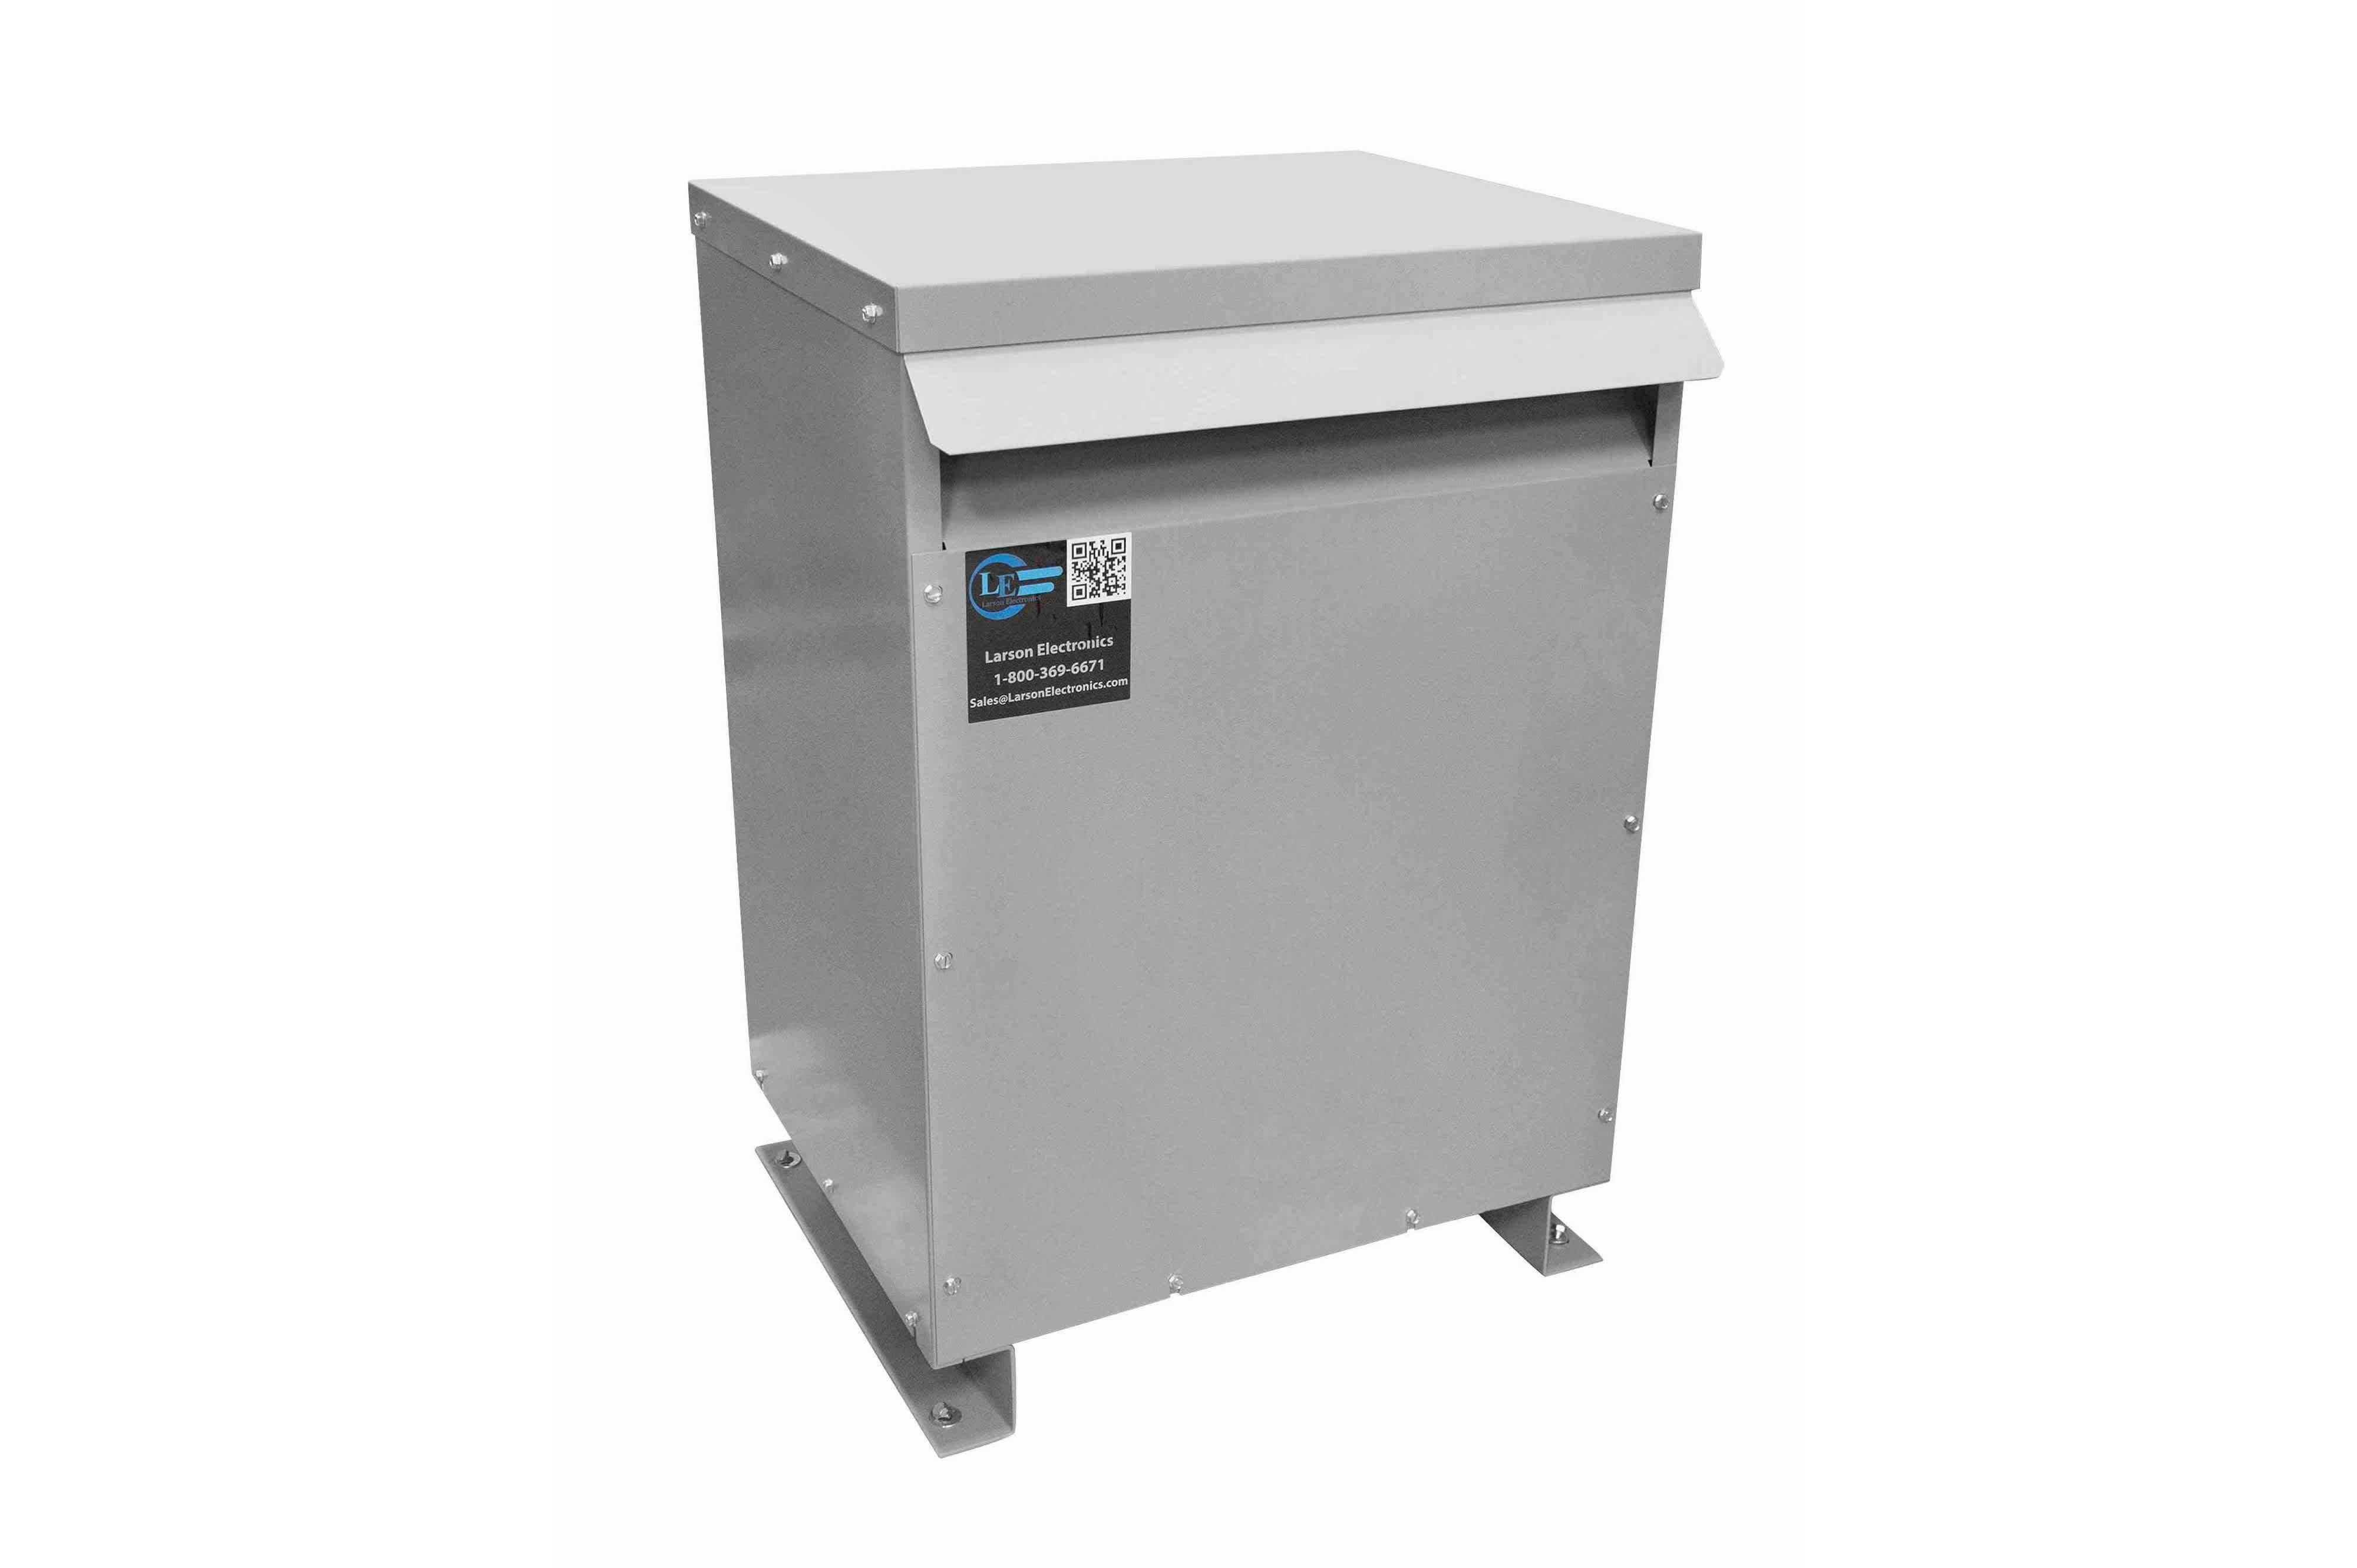 38 kVA 3PH Isolation Transformer, 380V Wye Primary, 240V Delta Secondary, N3R, Ventilated, 60 Hz